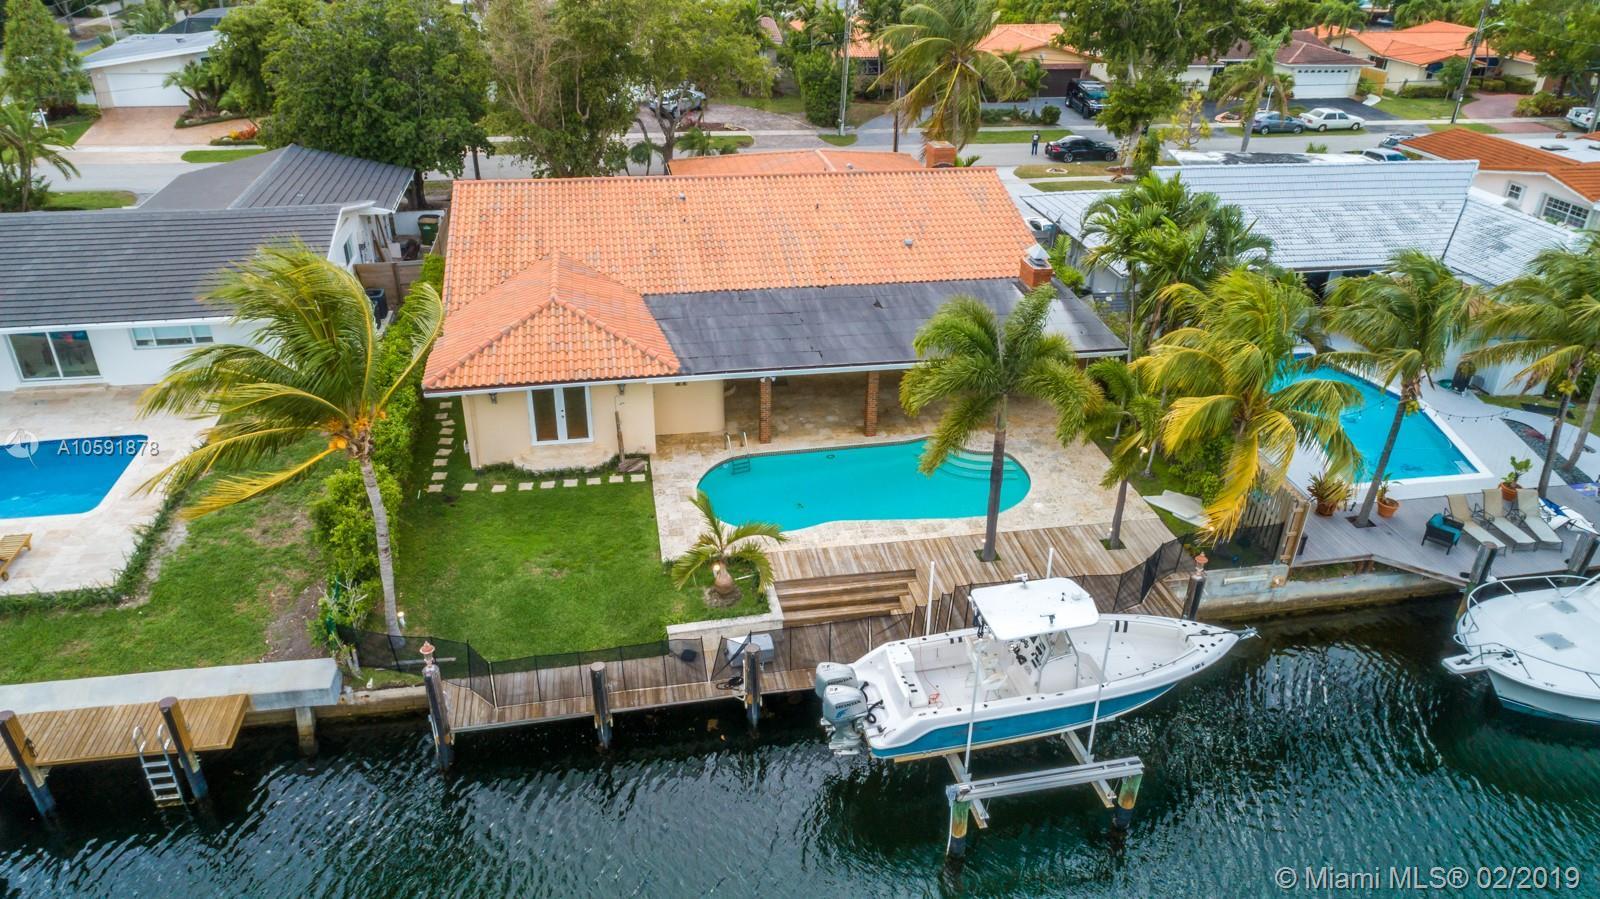 13005 keystone terrace, North Miami, FL 33181